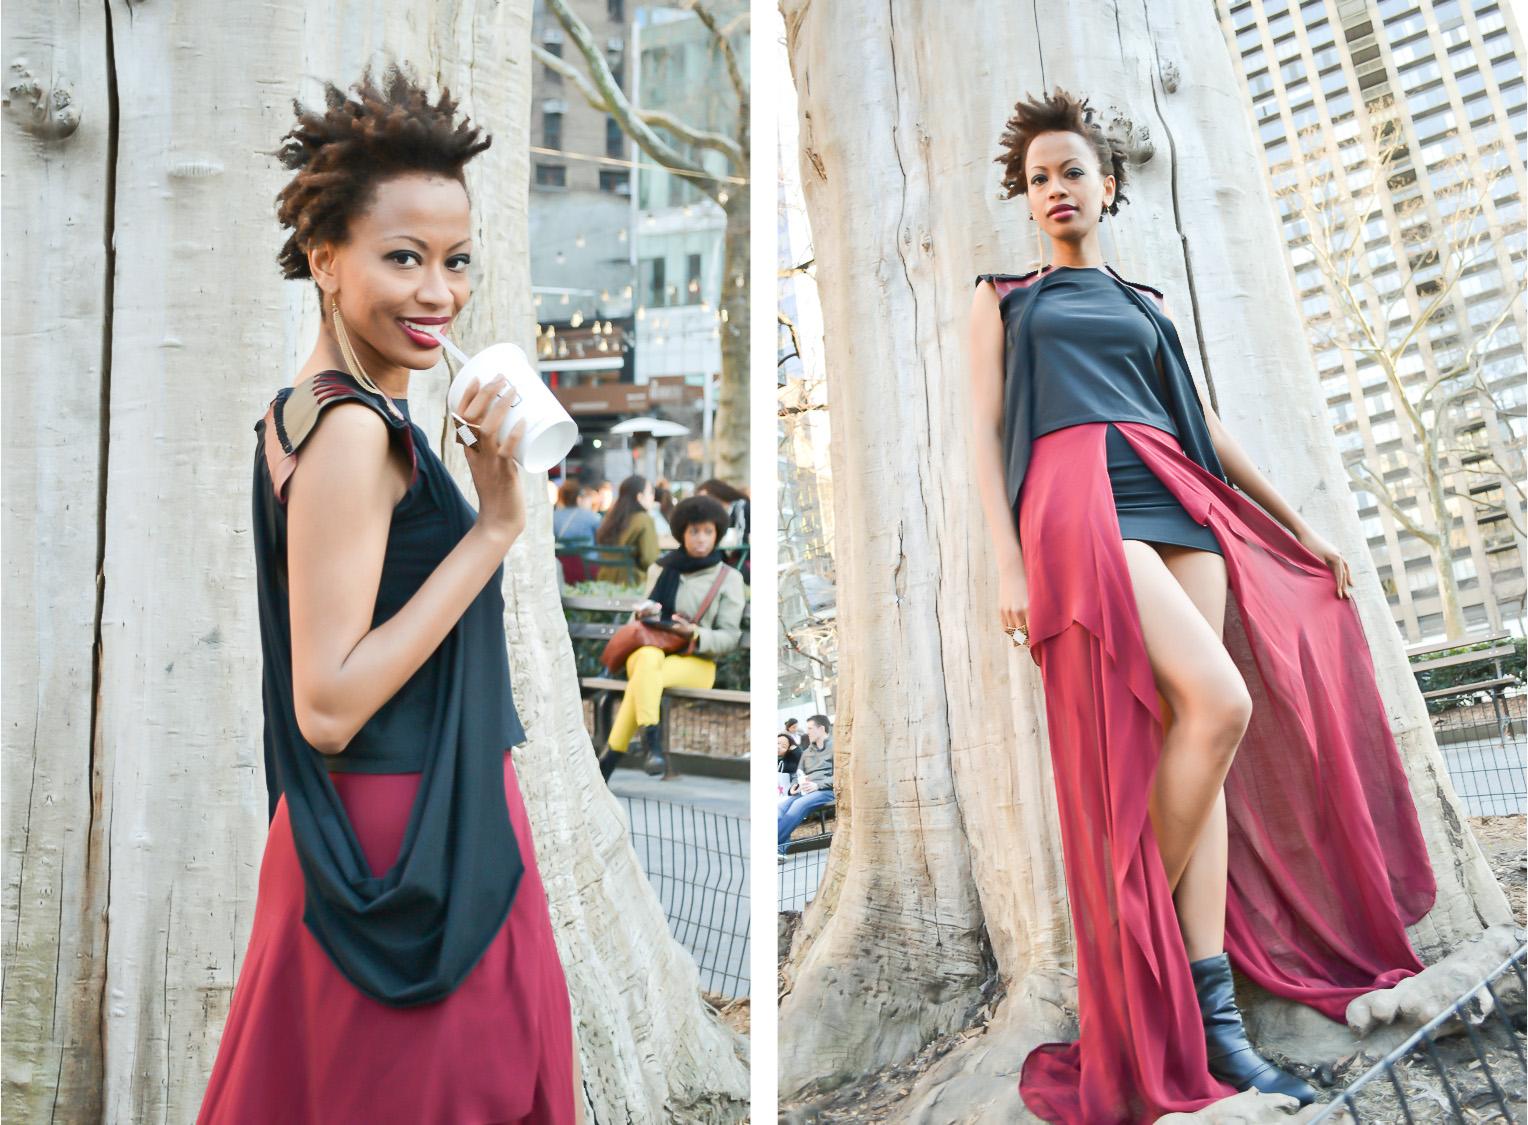 kele-mogotsi_botswanas-best-actors_best-actresses-botswana_the-last-of-us-film_new-york-based-batswana_kelebogile-mogotsi_afro-hair-models-new-york_natural-hair-inspiration-botswana-3